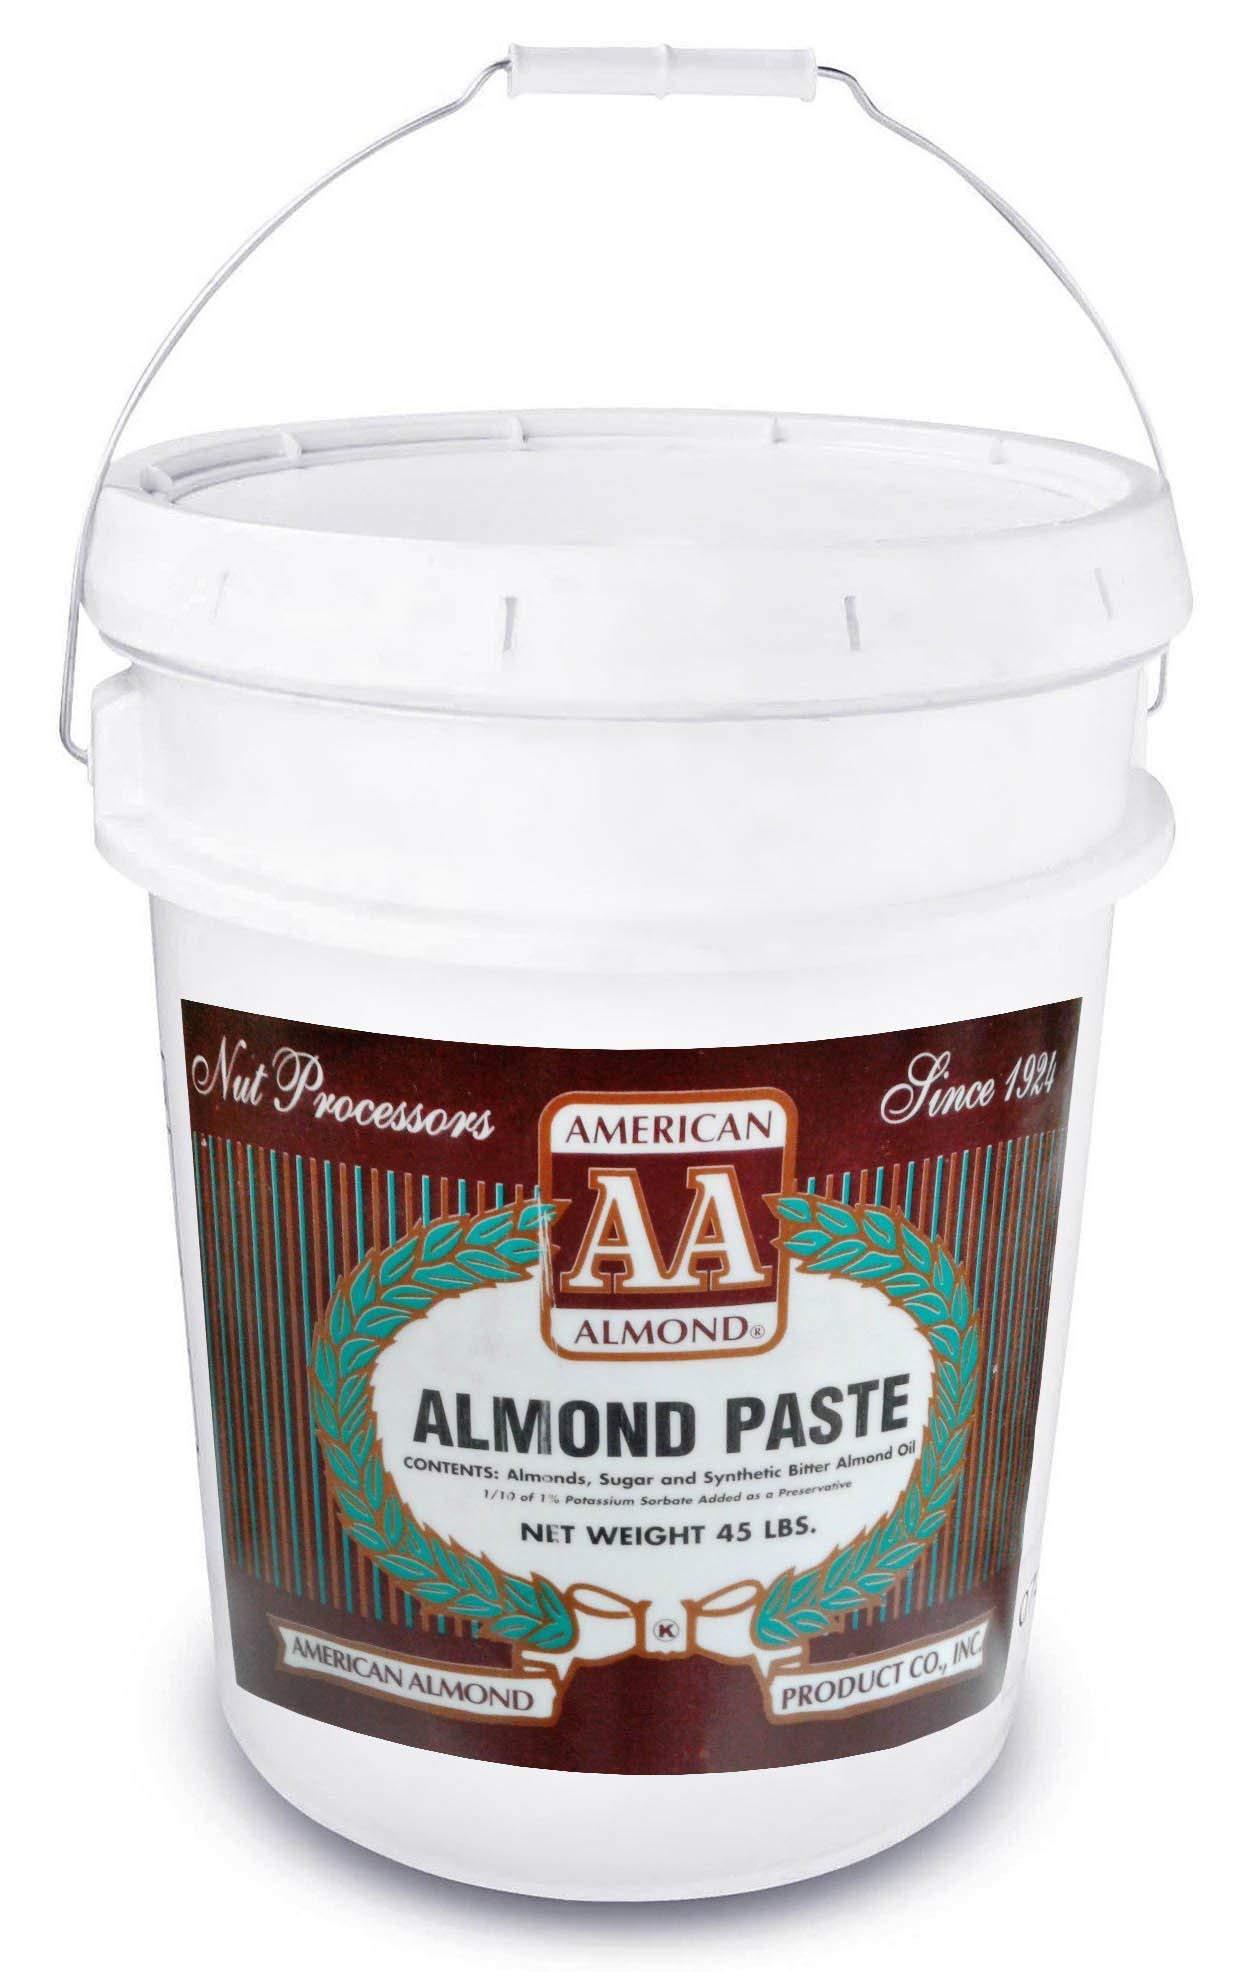 American Almond Almond Paste - 45 lb Tub by American Almond (Image #1)